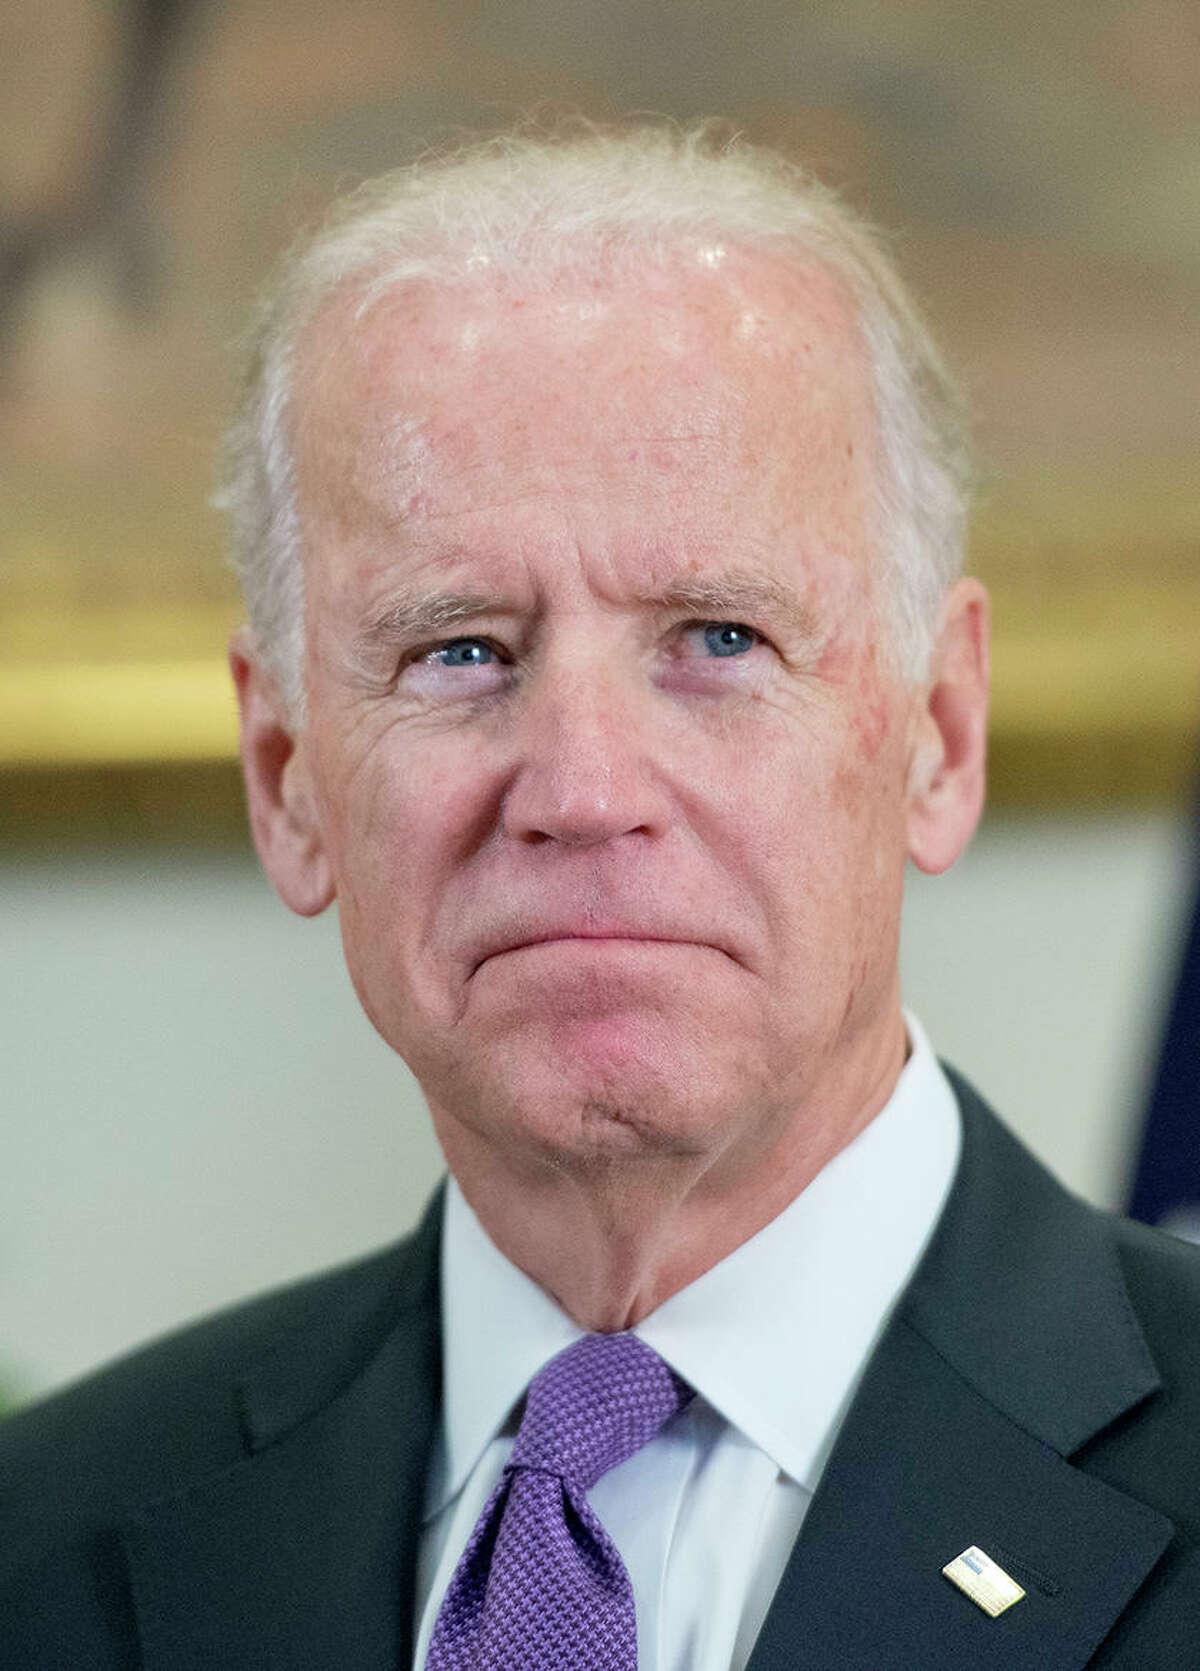 Joe Biden: He has 55-40 percent lead on President Trump in new ABC News/Washington Post poll. | Photo Credits: Ron Sachs/CNP/AdMedia, © Ron Sachs/CNP/AdMedia/AdMedia/Corbis